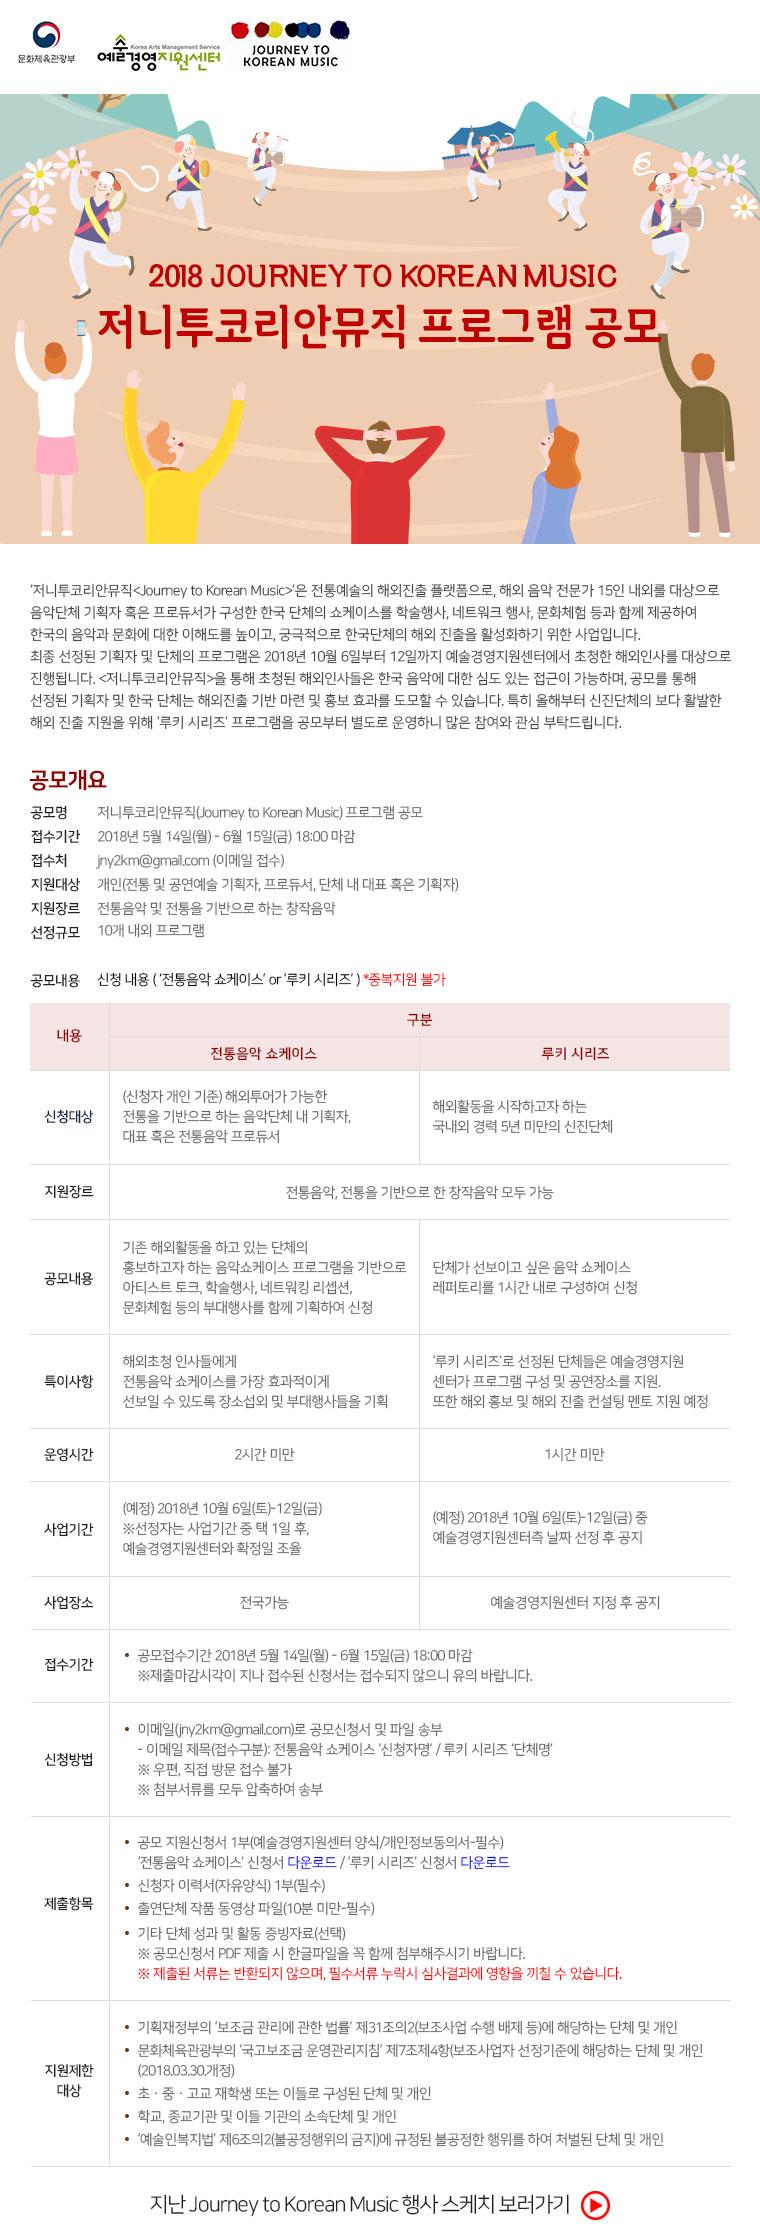 2018 JOURNEY TO KOREAN MUSIC 저니투코리안뮤직 프로그램 공모